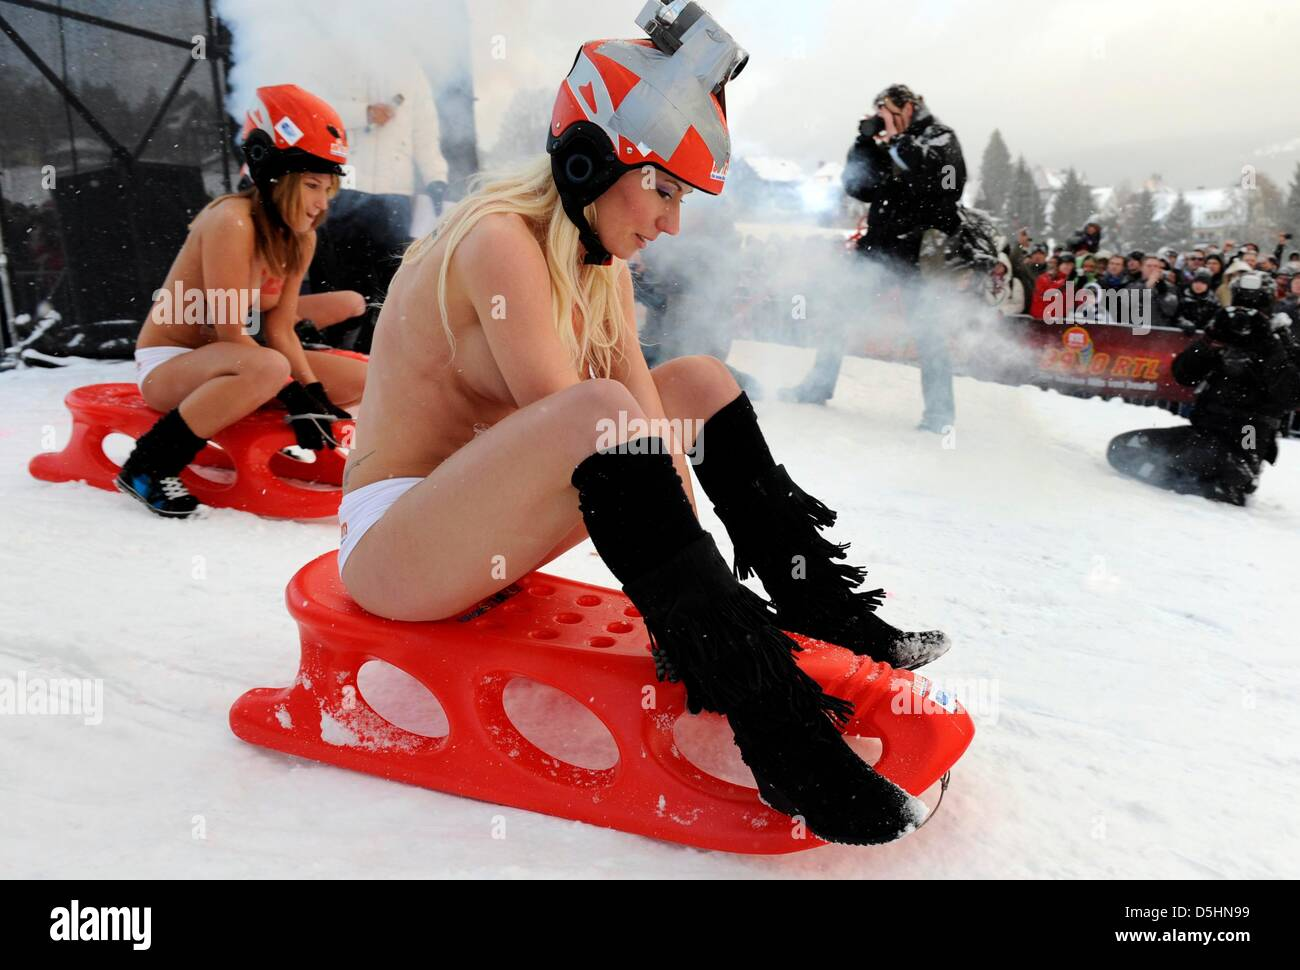 Women skiing nude